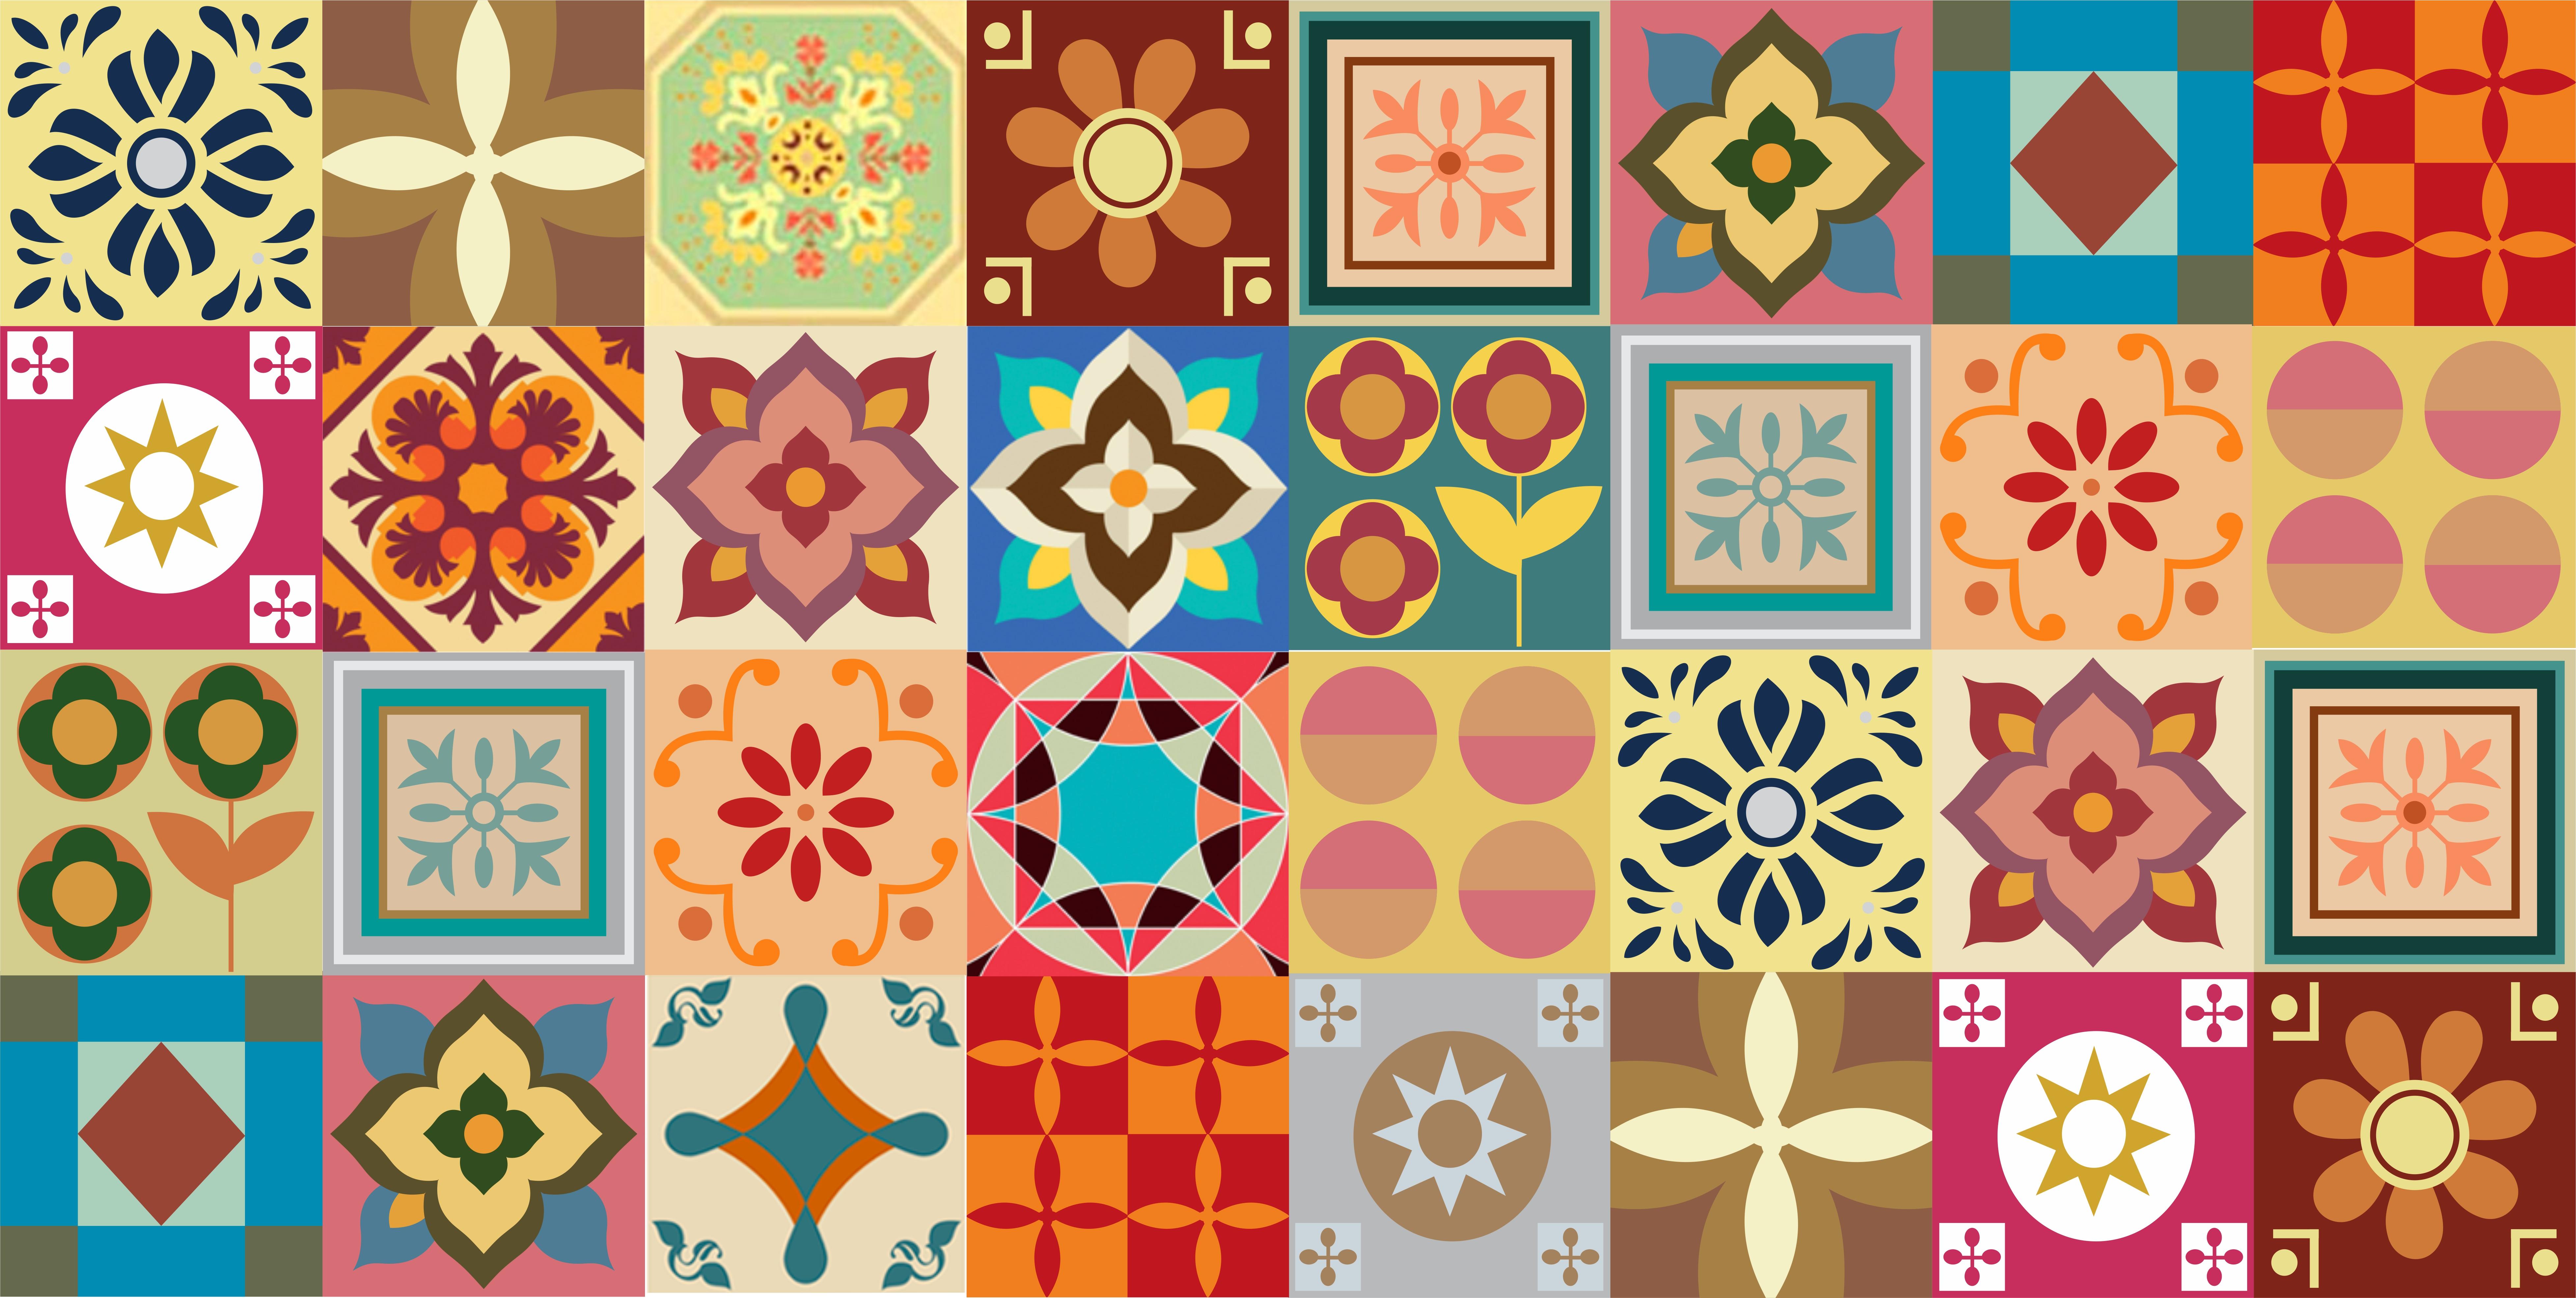 Adesivo de parede azulejos 14 wall magic adesivos elo7 for Papel adhesivo para azulejos